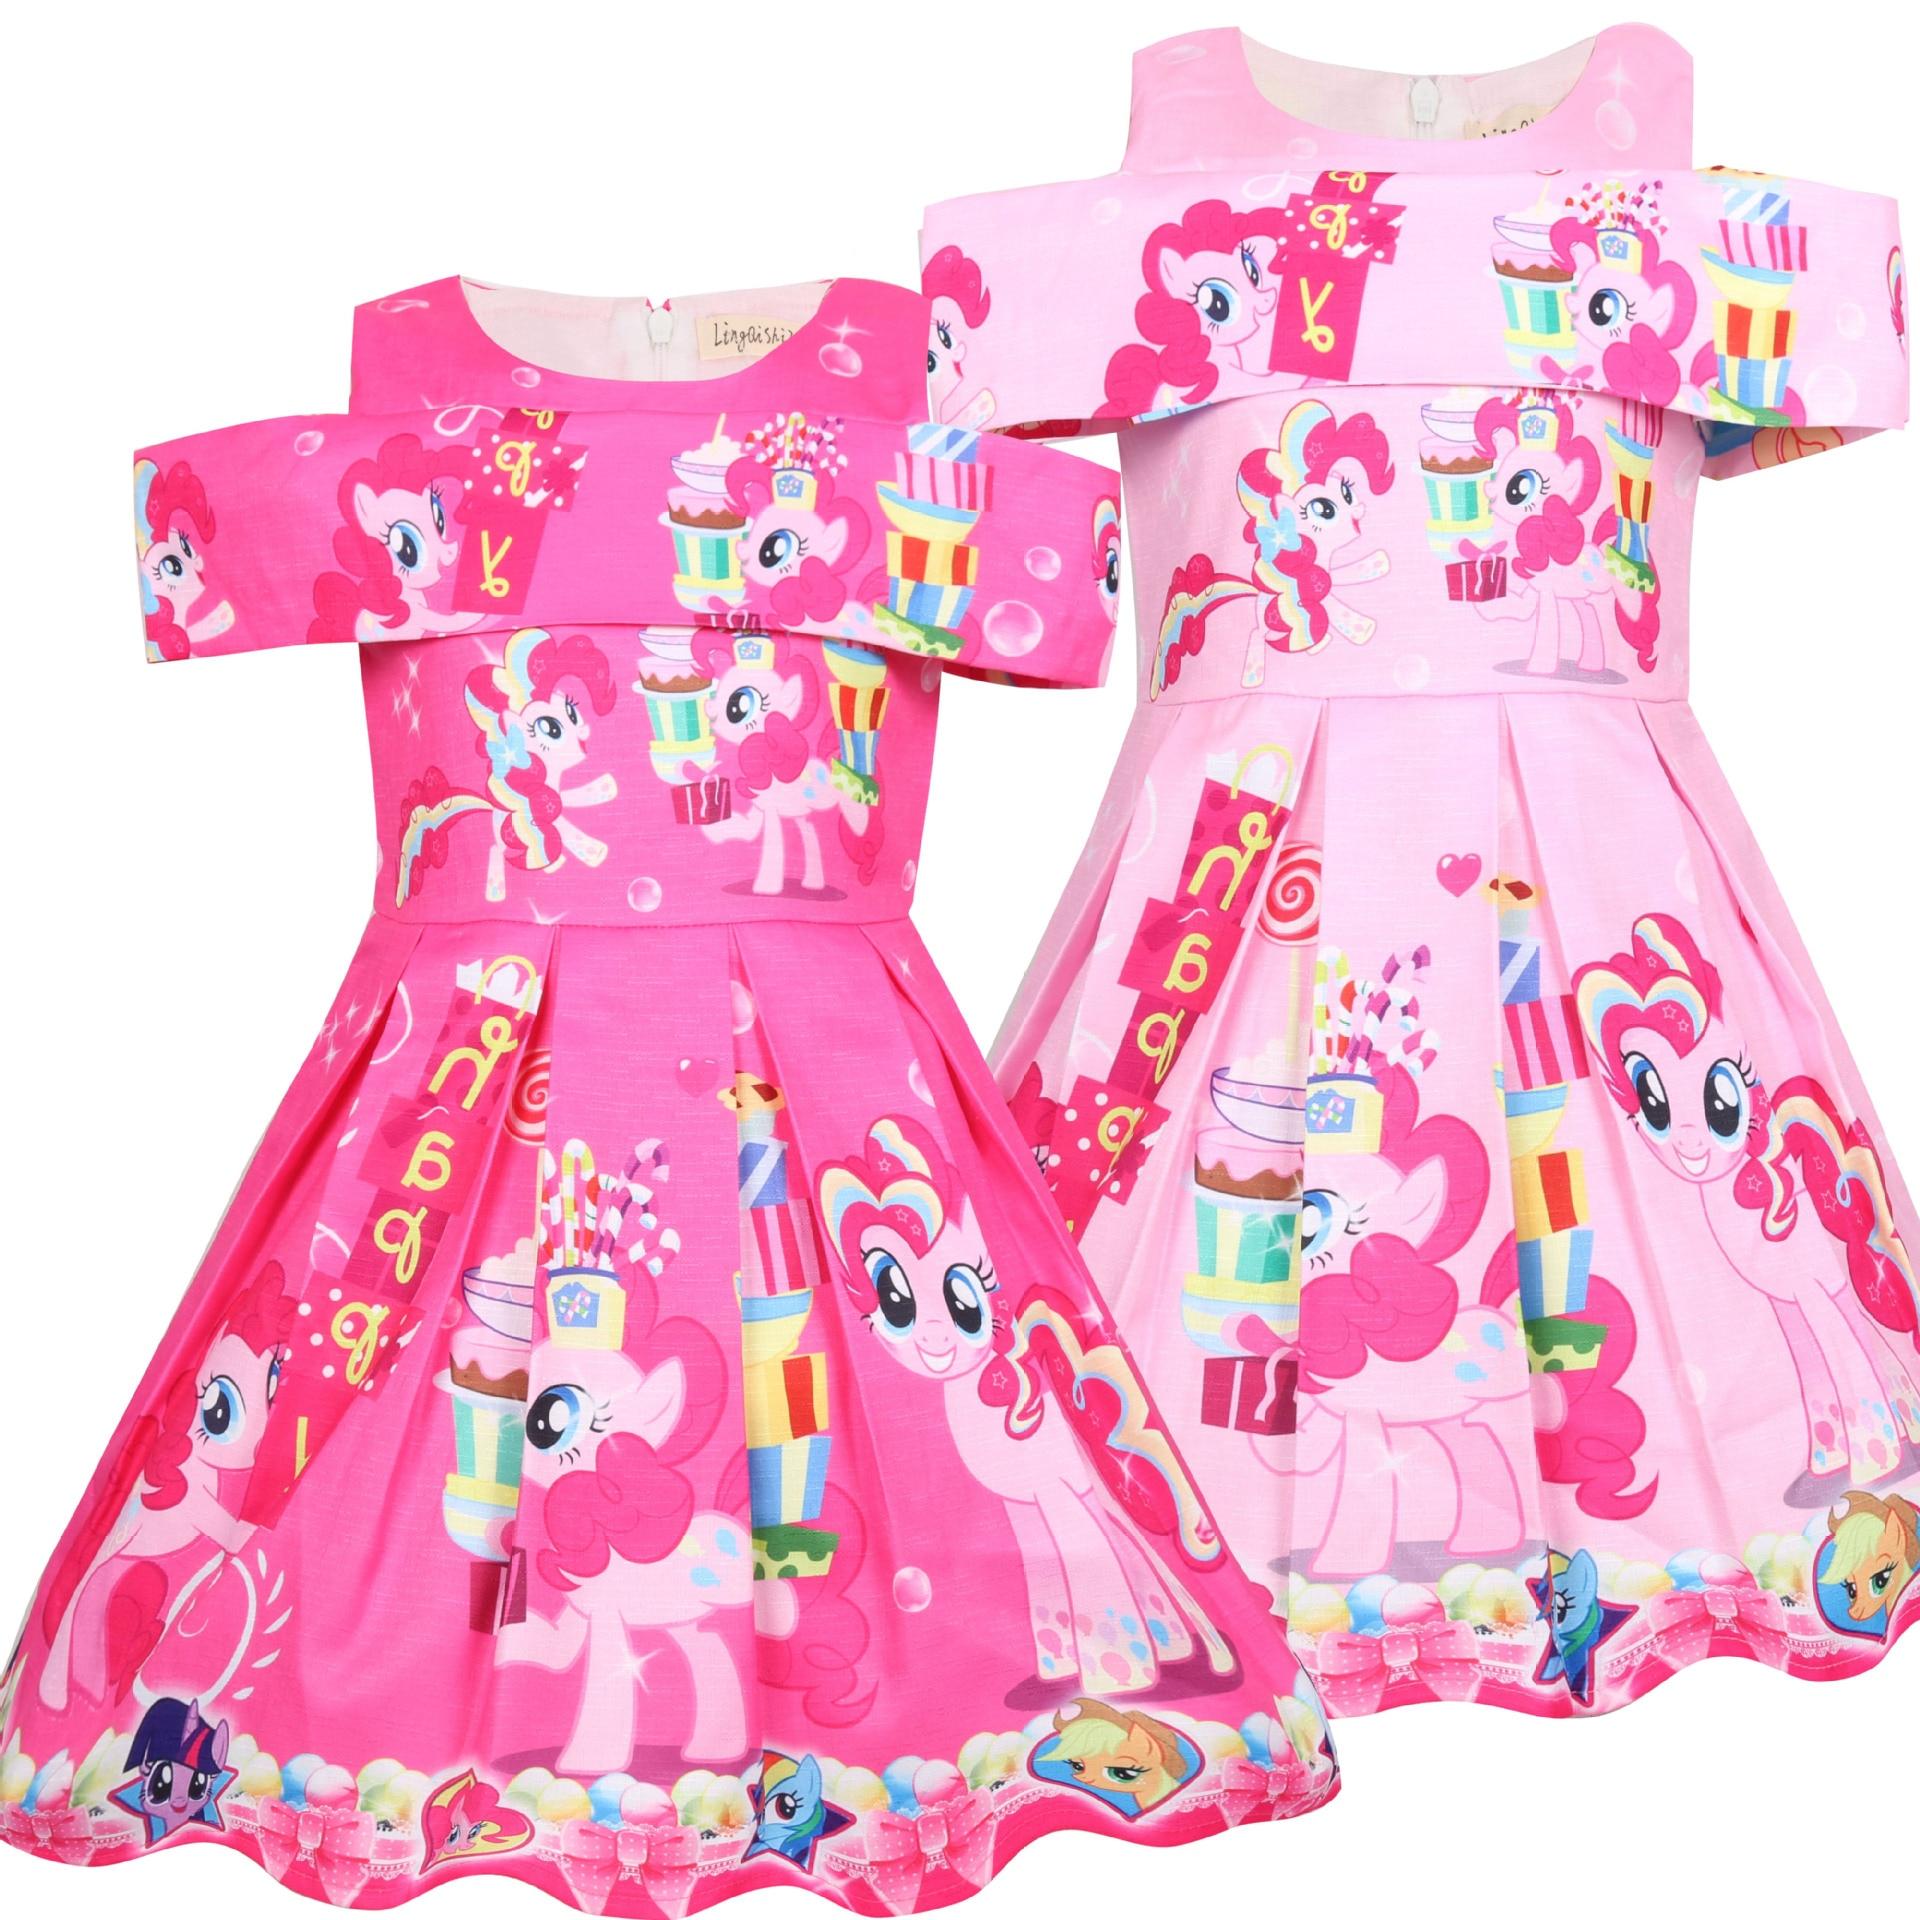 New Girls My Little Pony Princess Dress Kids Party Birthday Costume Dress